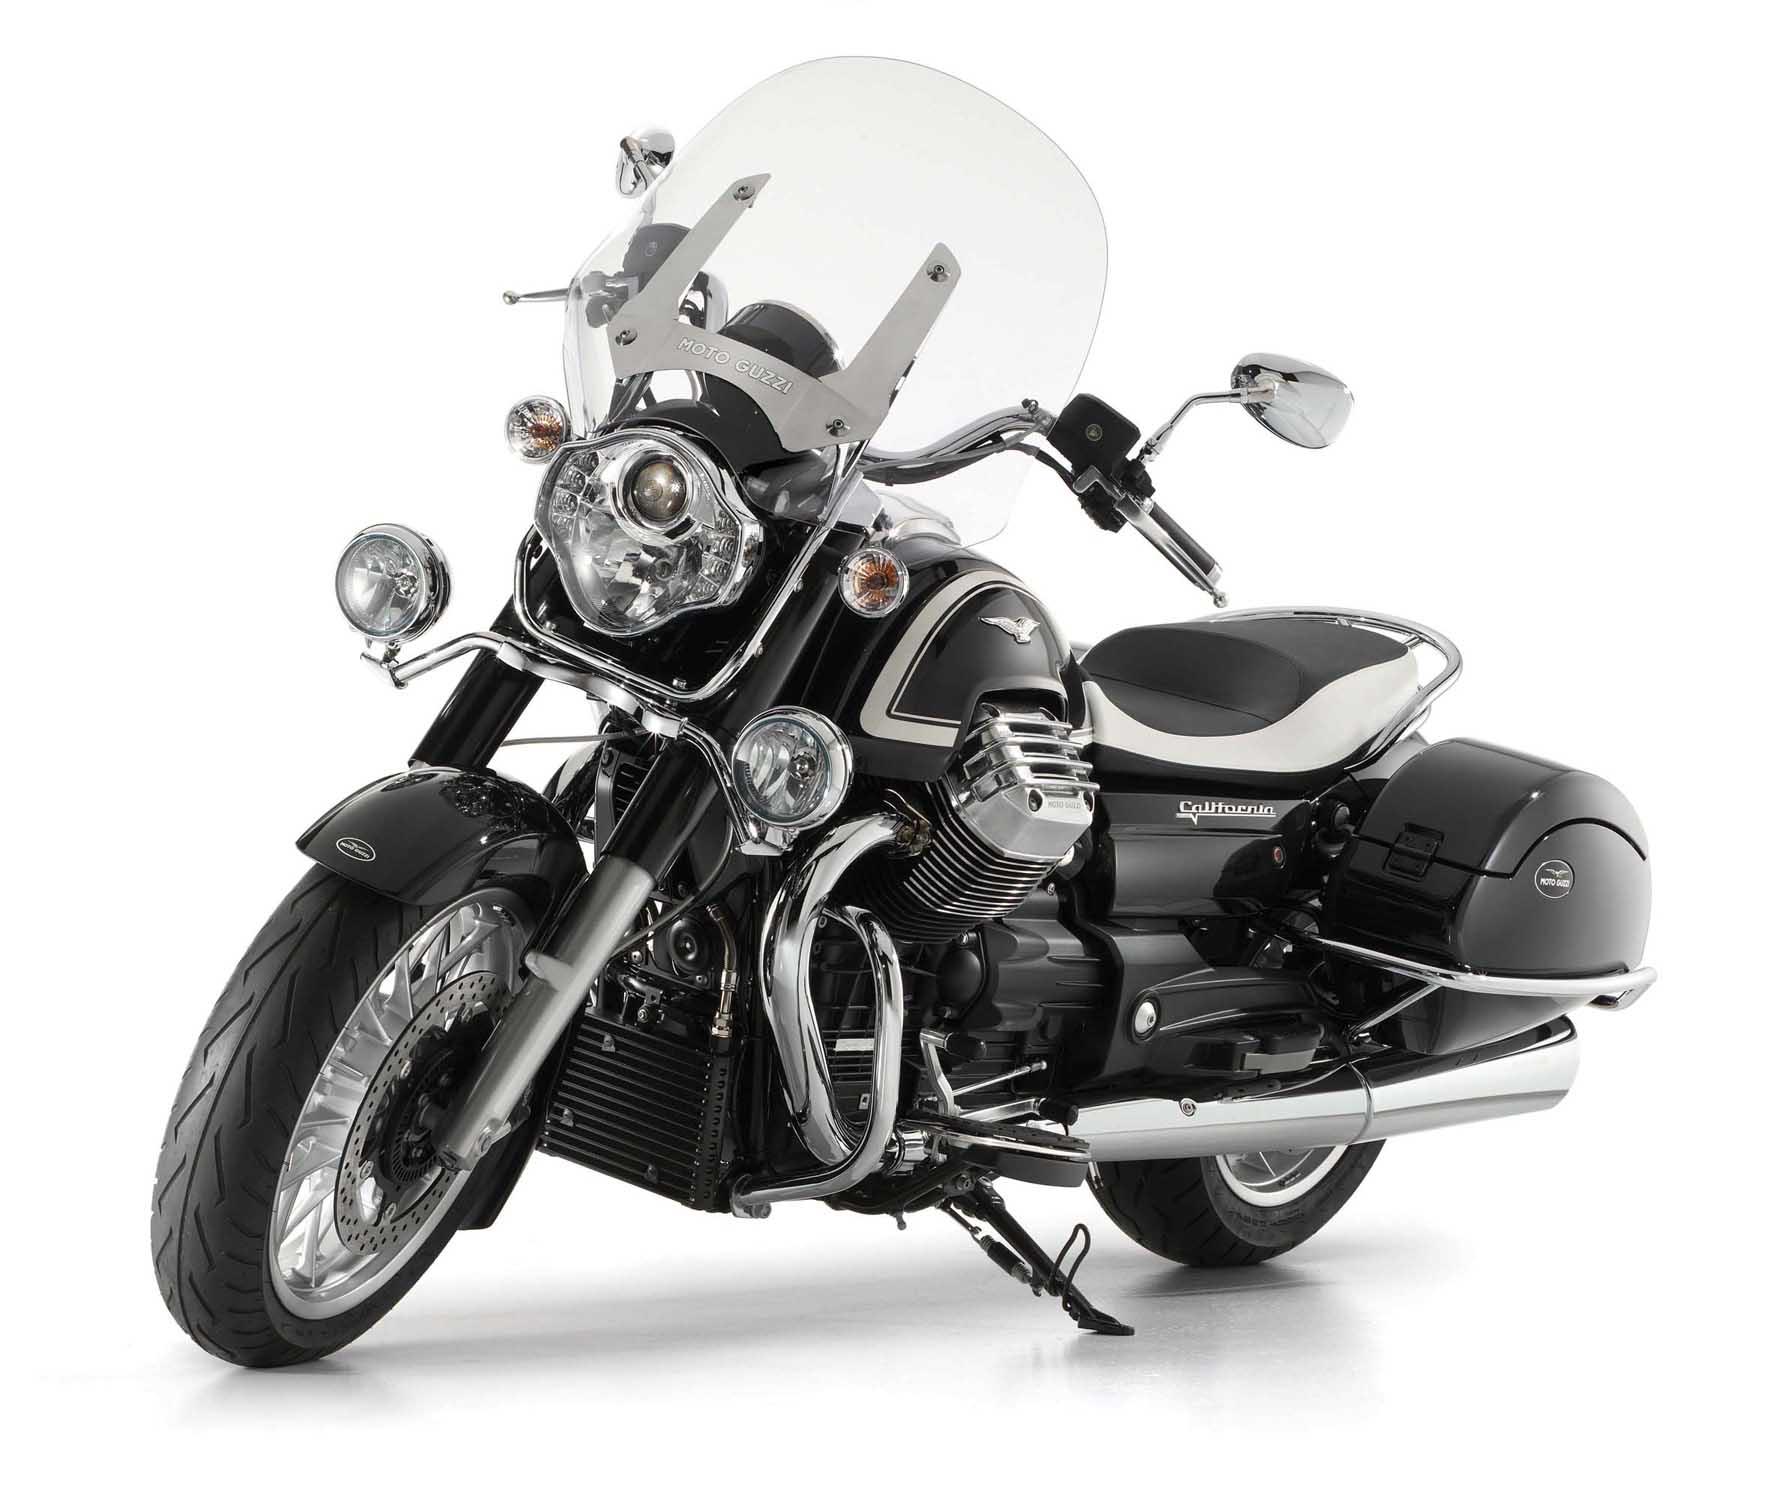 Eicma-2012-Moto-Guzzi-california